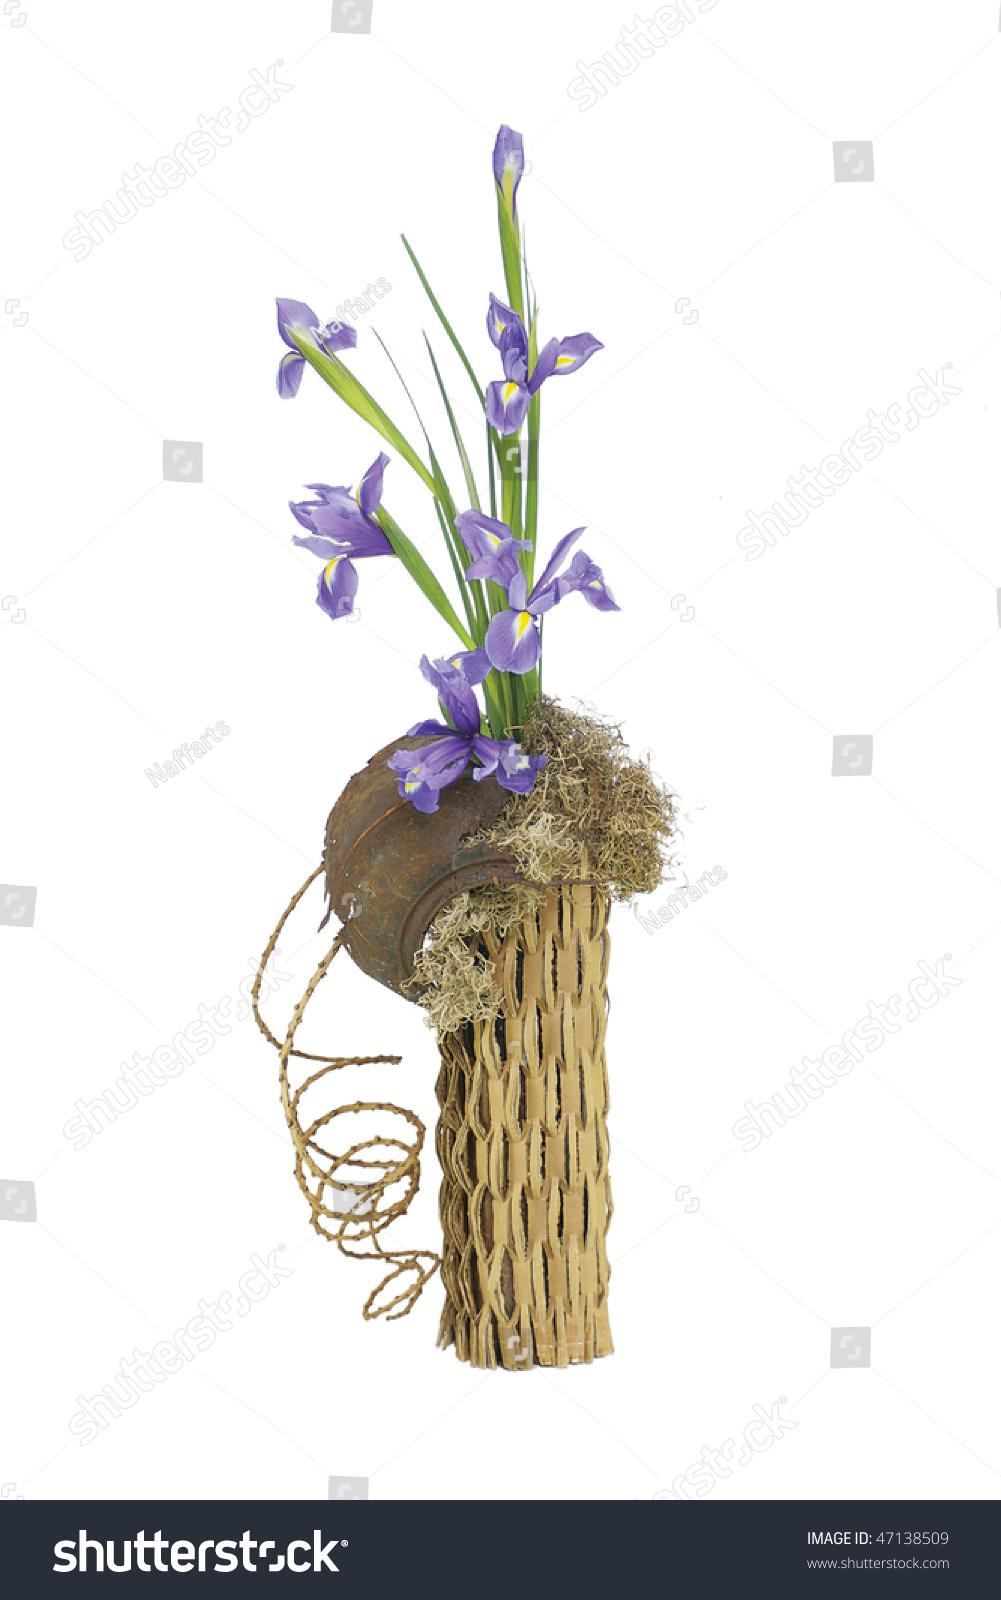 Floral arrangement purple iris set on stock photo edit now a floral arrangement of purple iris set on a white isolated background purple iris flowers izmirmasajfo